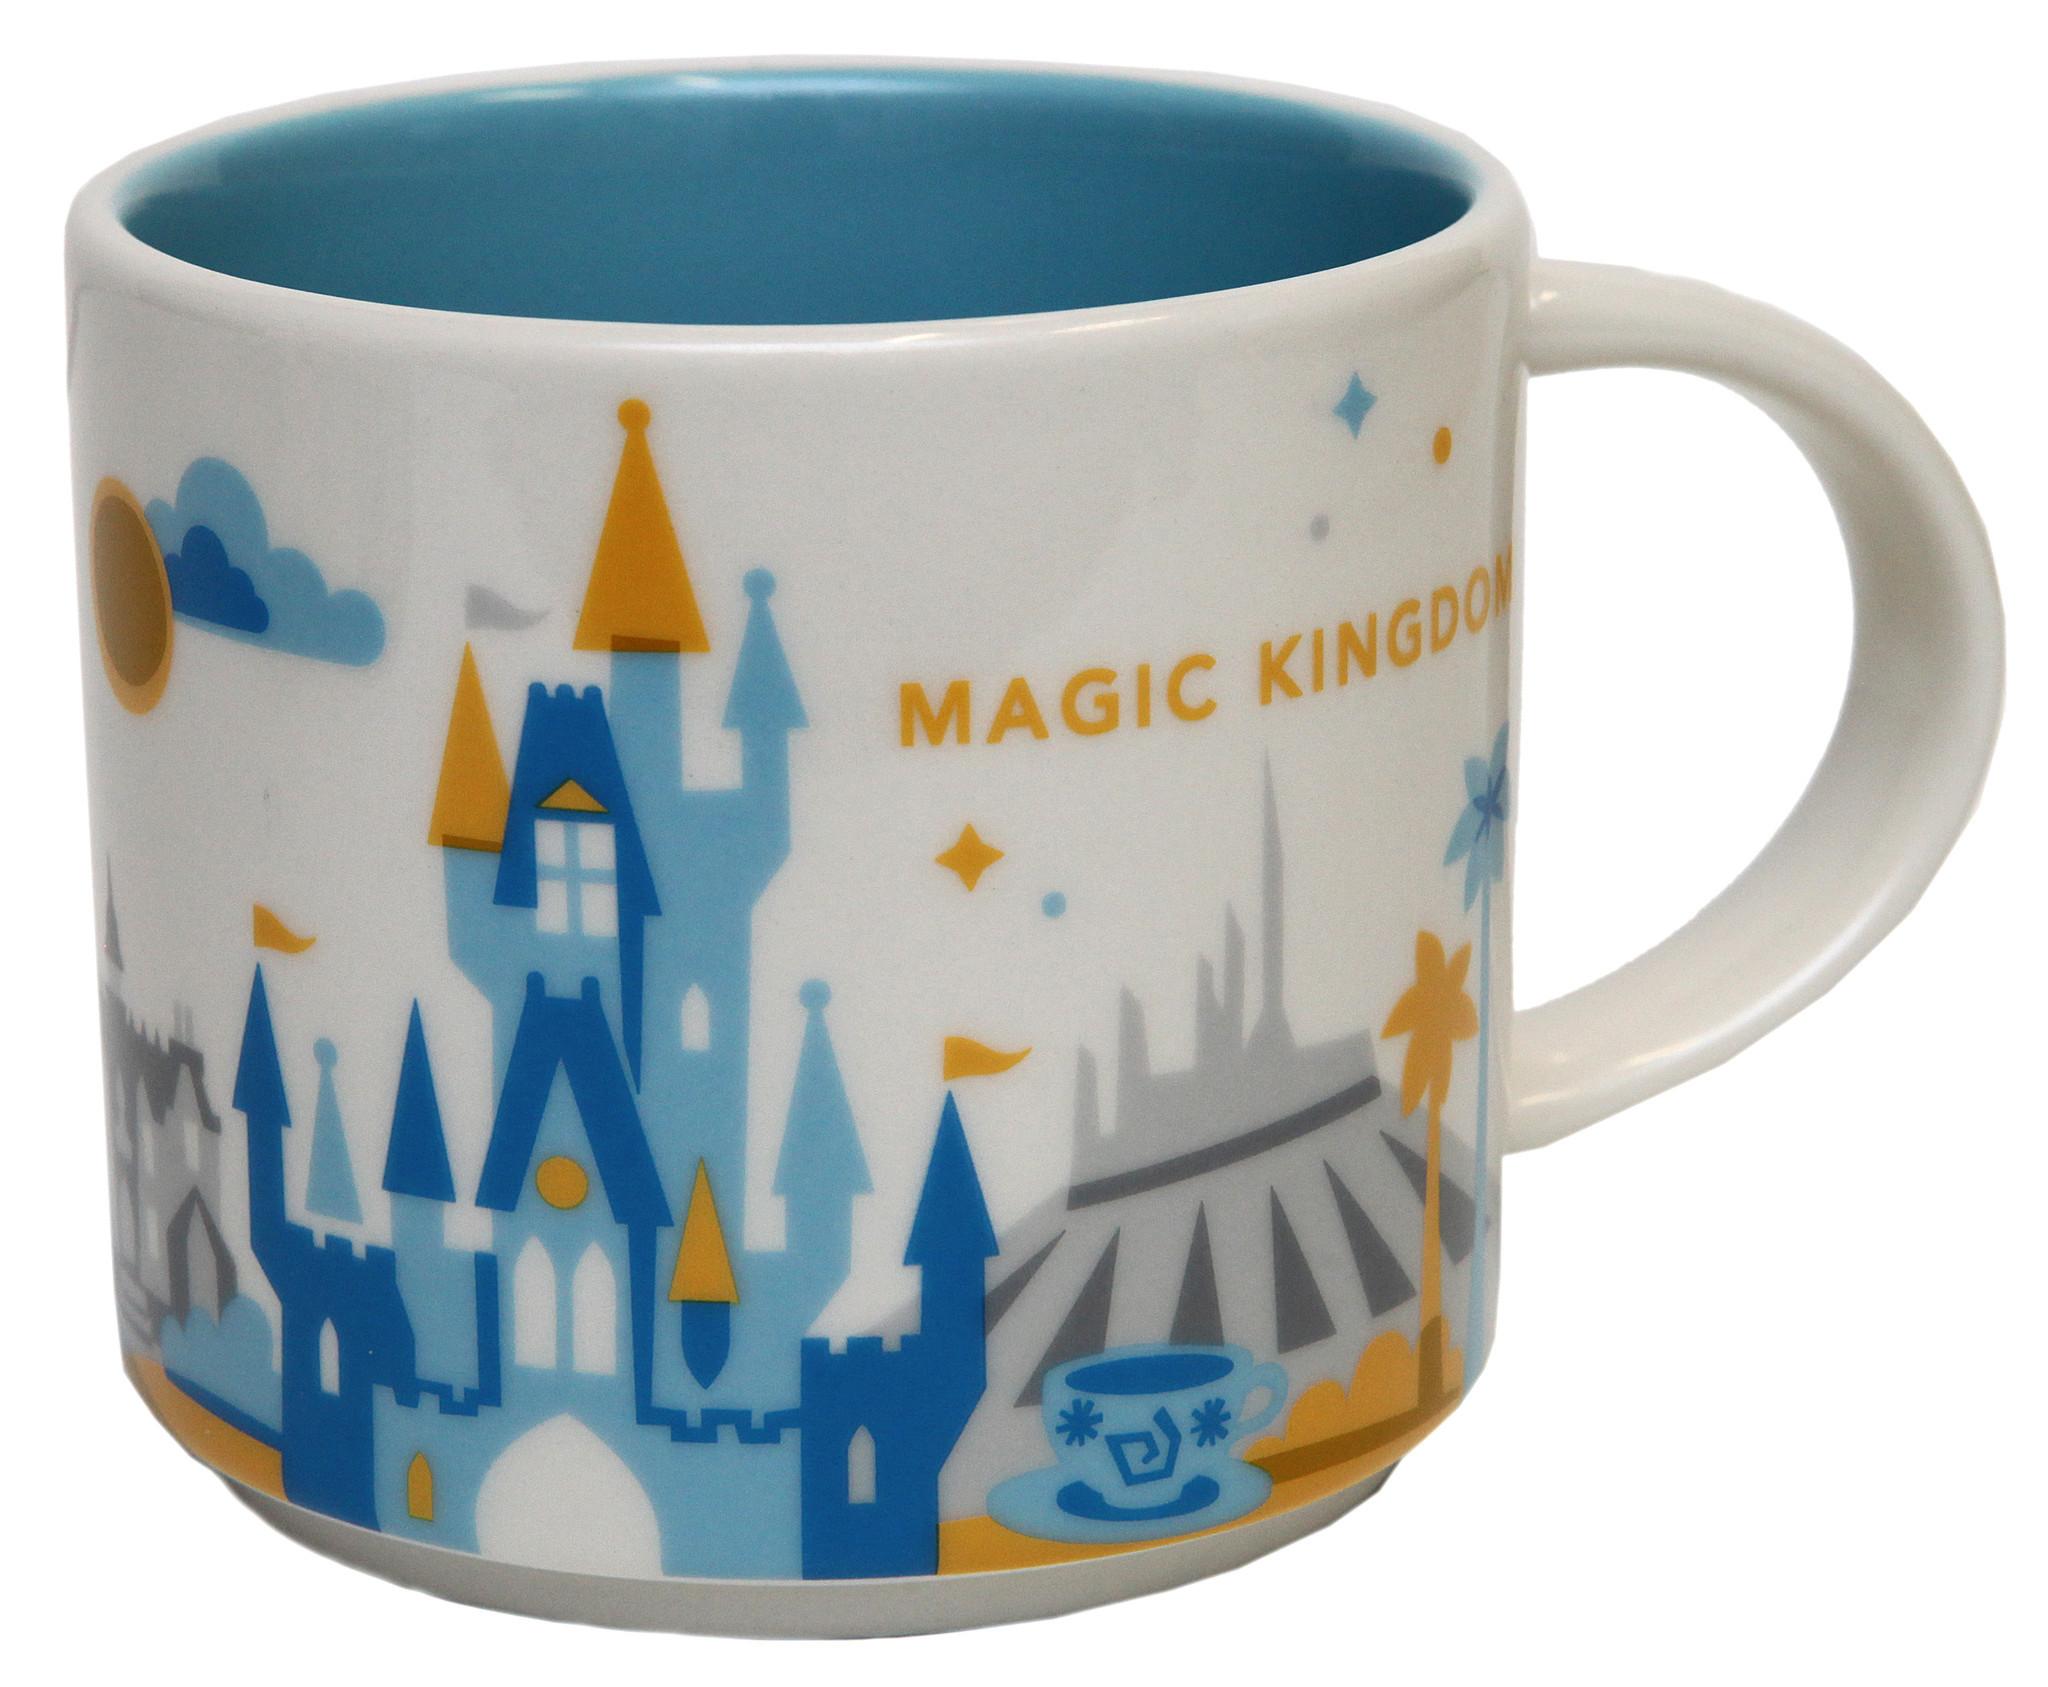 Starbucks Locations Selling Disney World Mugs Orlando